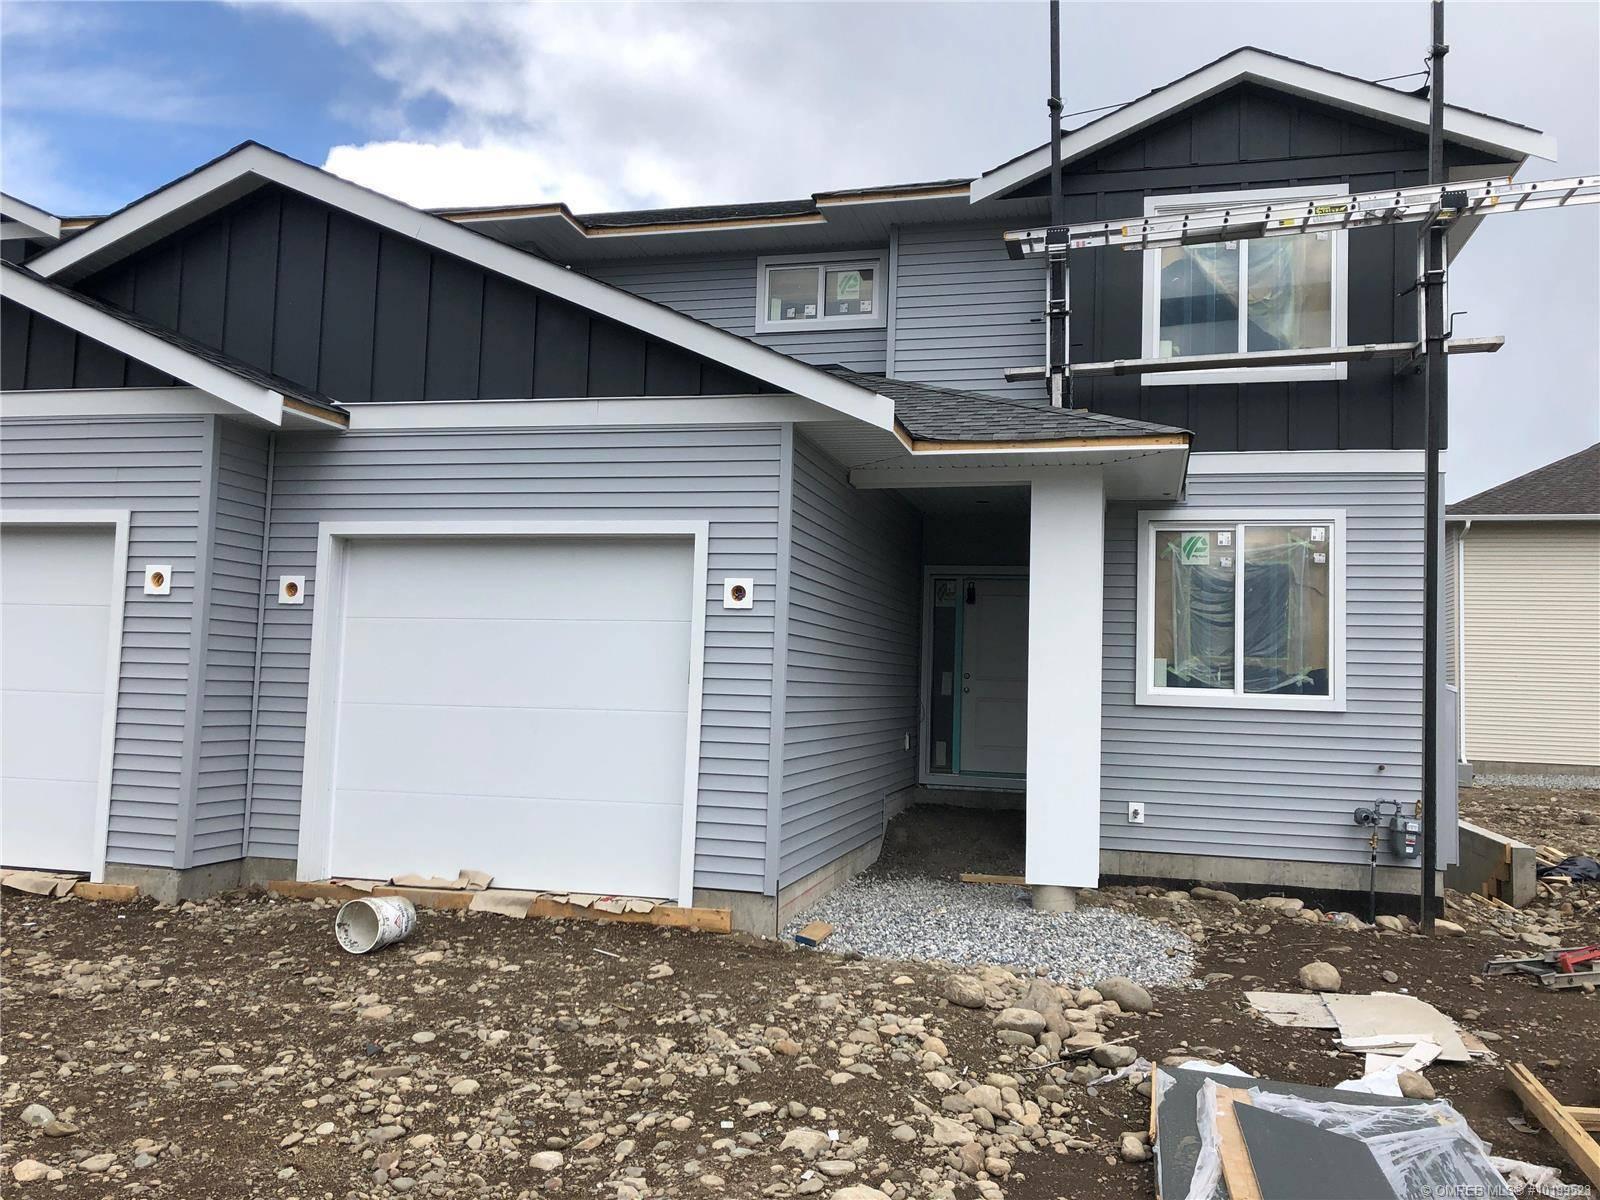 House for sale at 490 Sugars Ave Kelowna British Columbia - MLS: 10199523